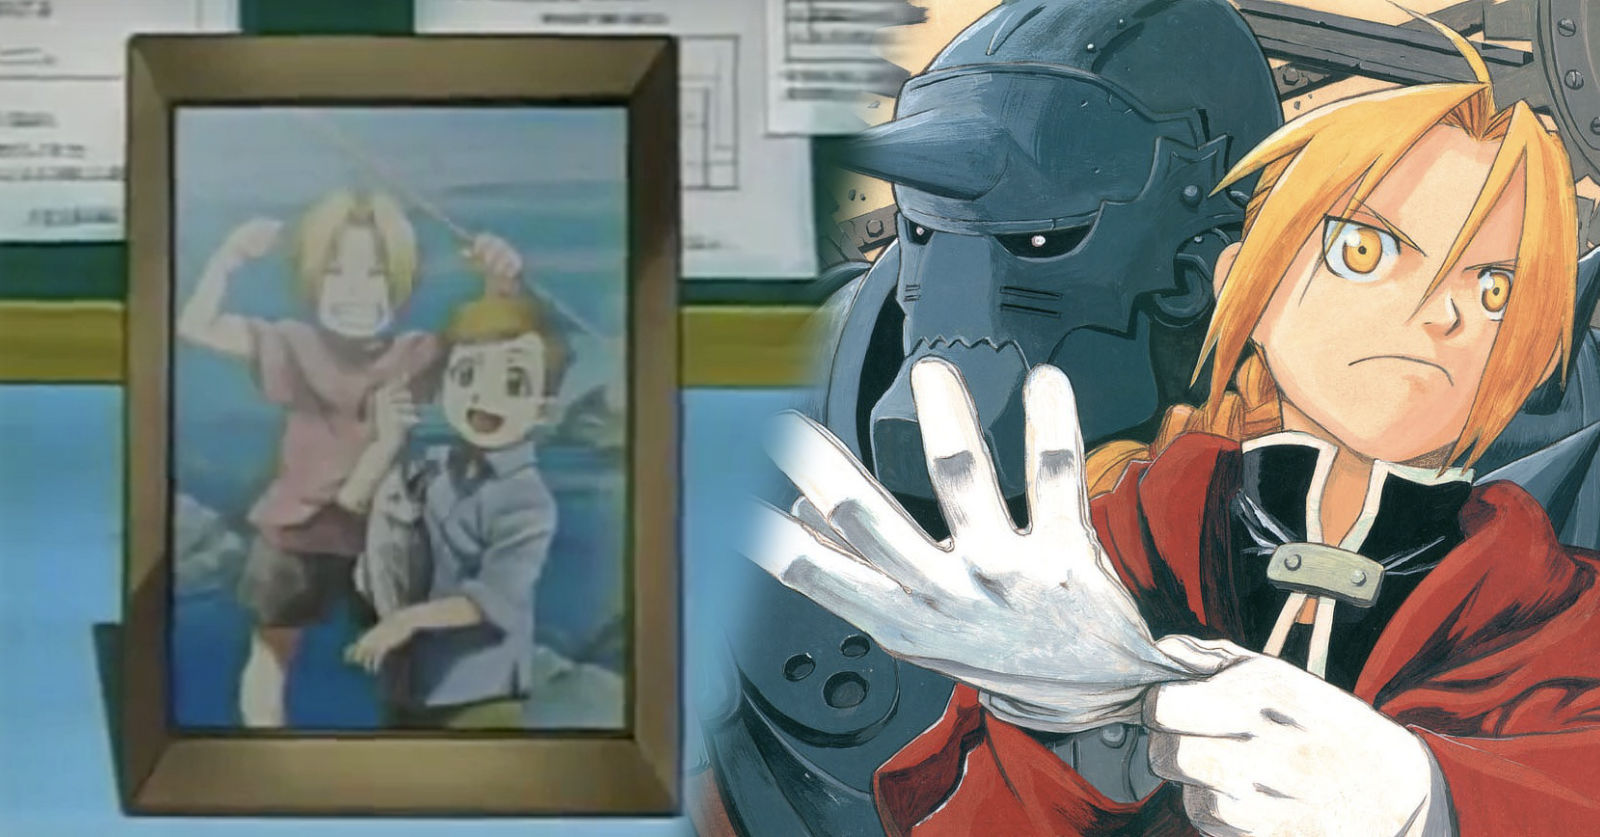 Fullmetal Alchemist Nina Tucker fullmetal alchemist: top 10 reasons the manga is better